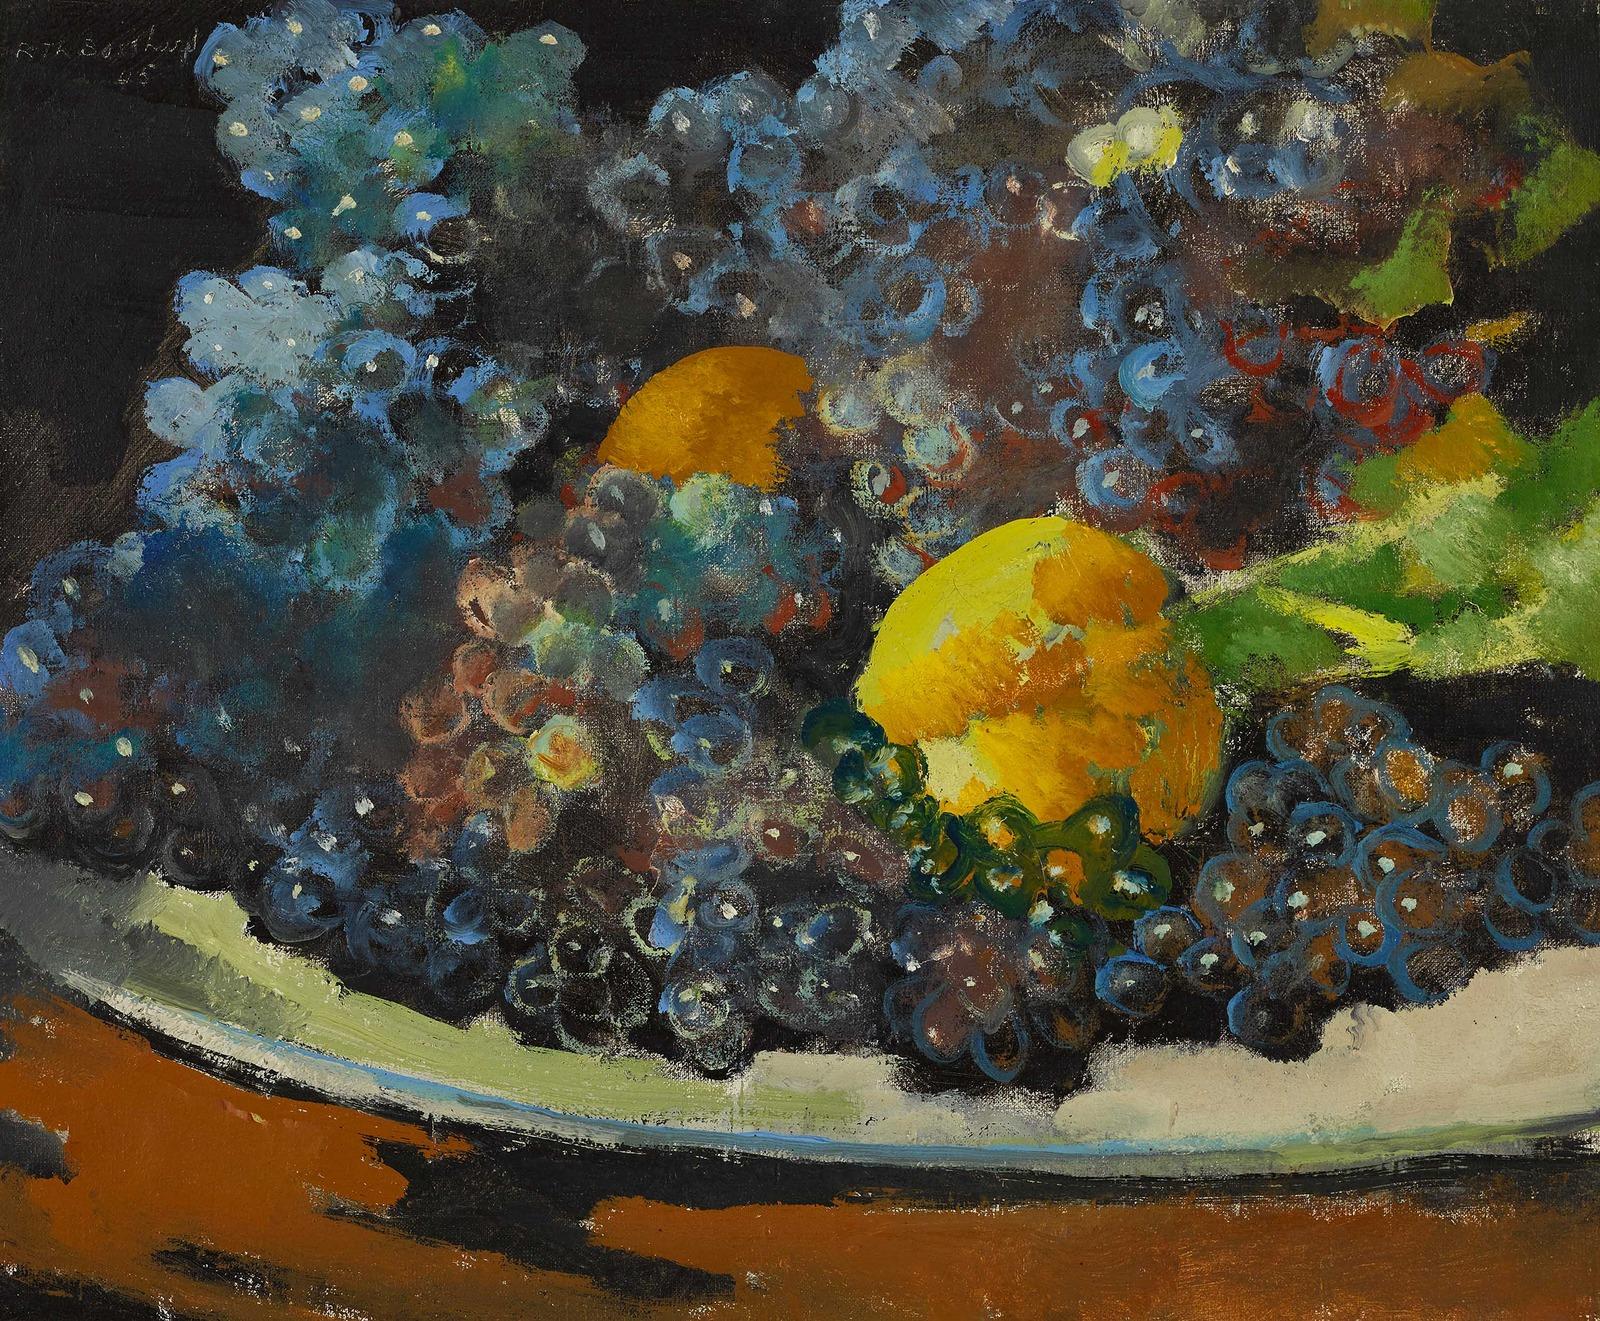 1945_Синий виноград и лимон (Raisin bleu et Citron)_37.5 х 46_х.,м._Частное собрание.jpg